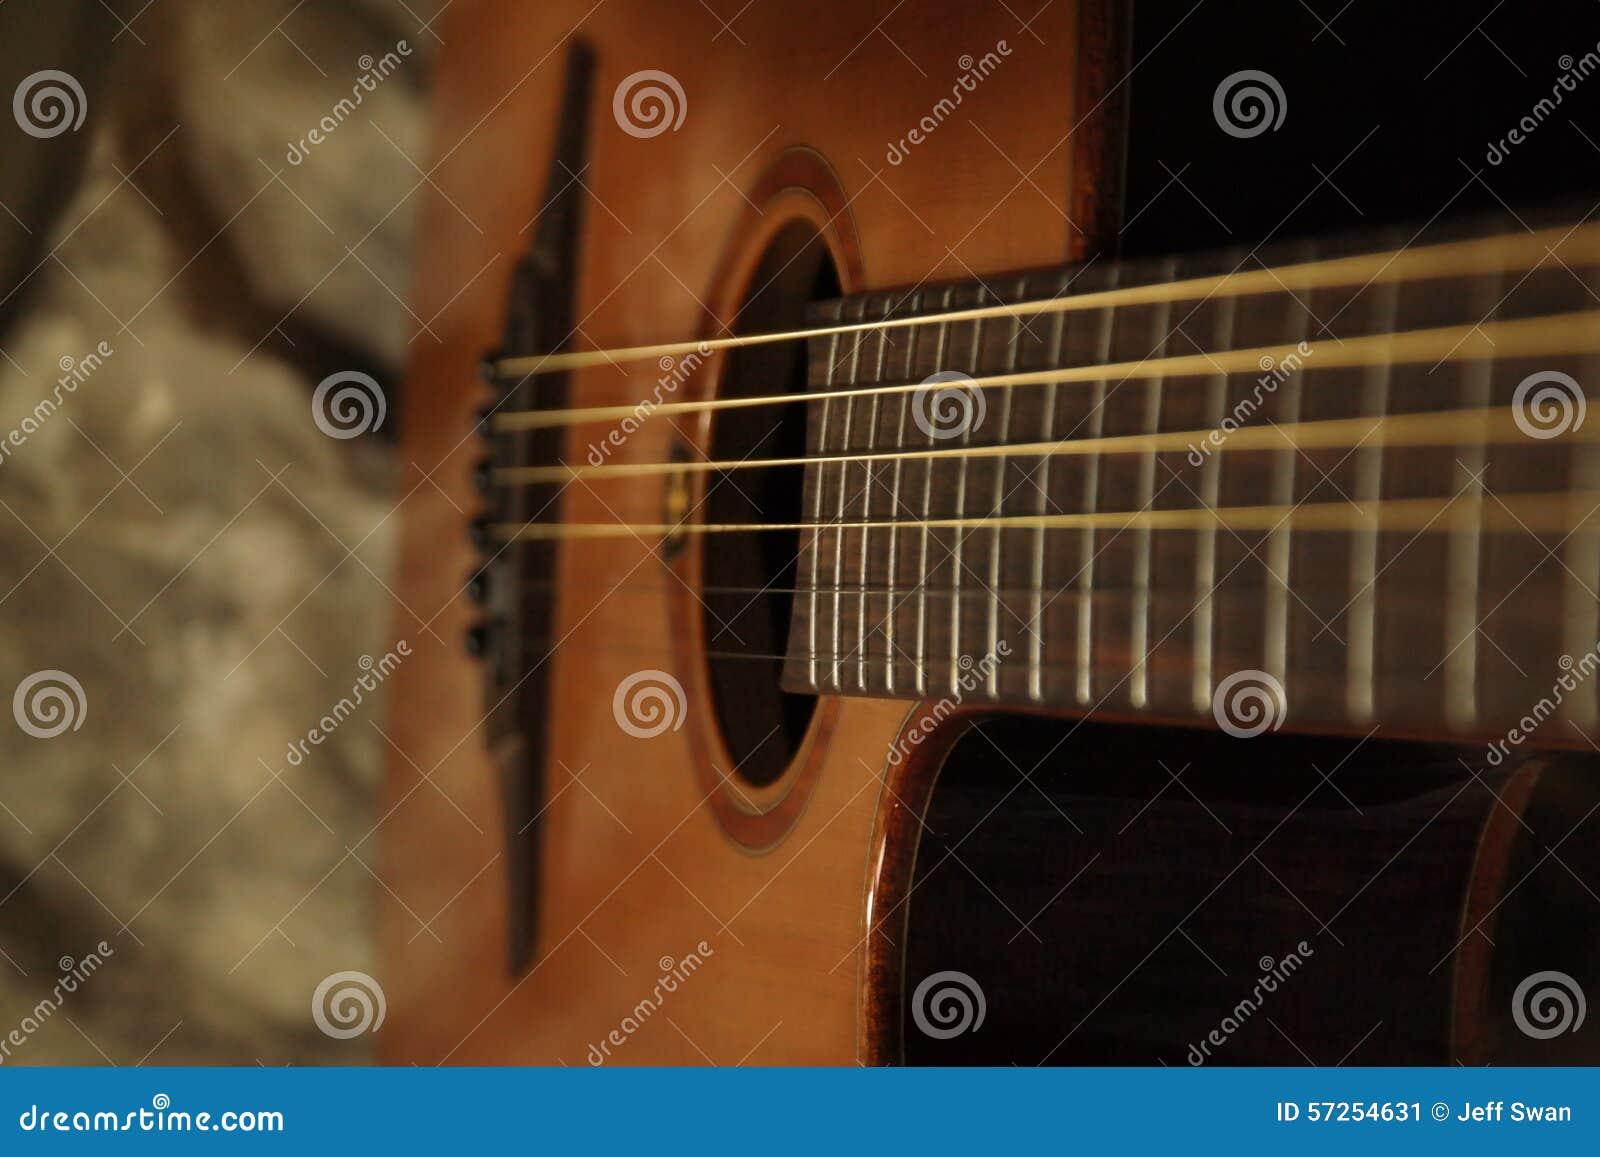 guitar stock photo image 57254631. Black Bedroom Furniture Sets. Home Design Ideas